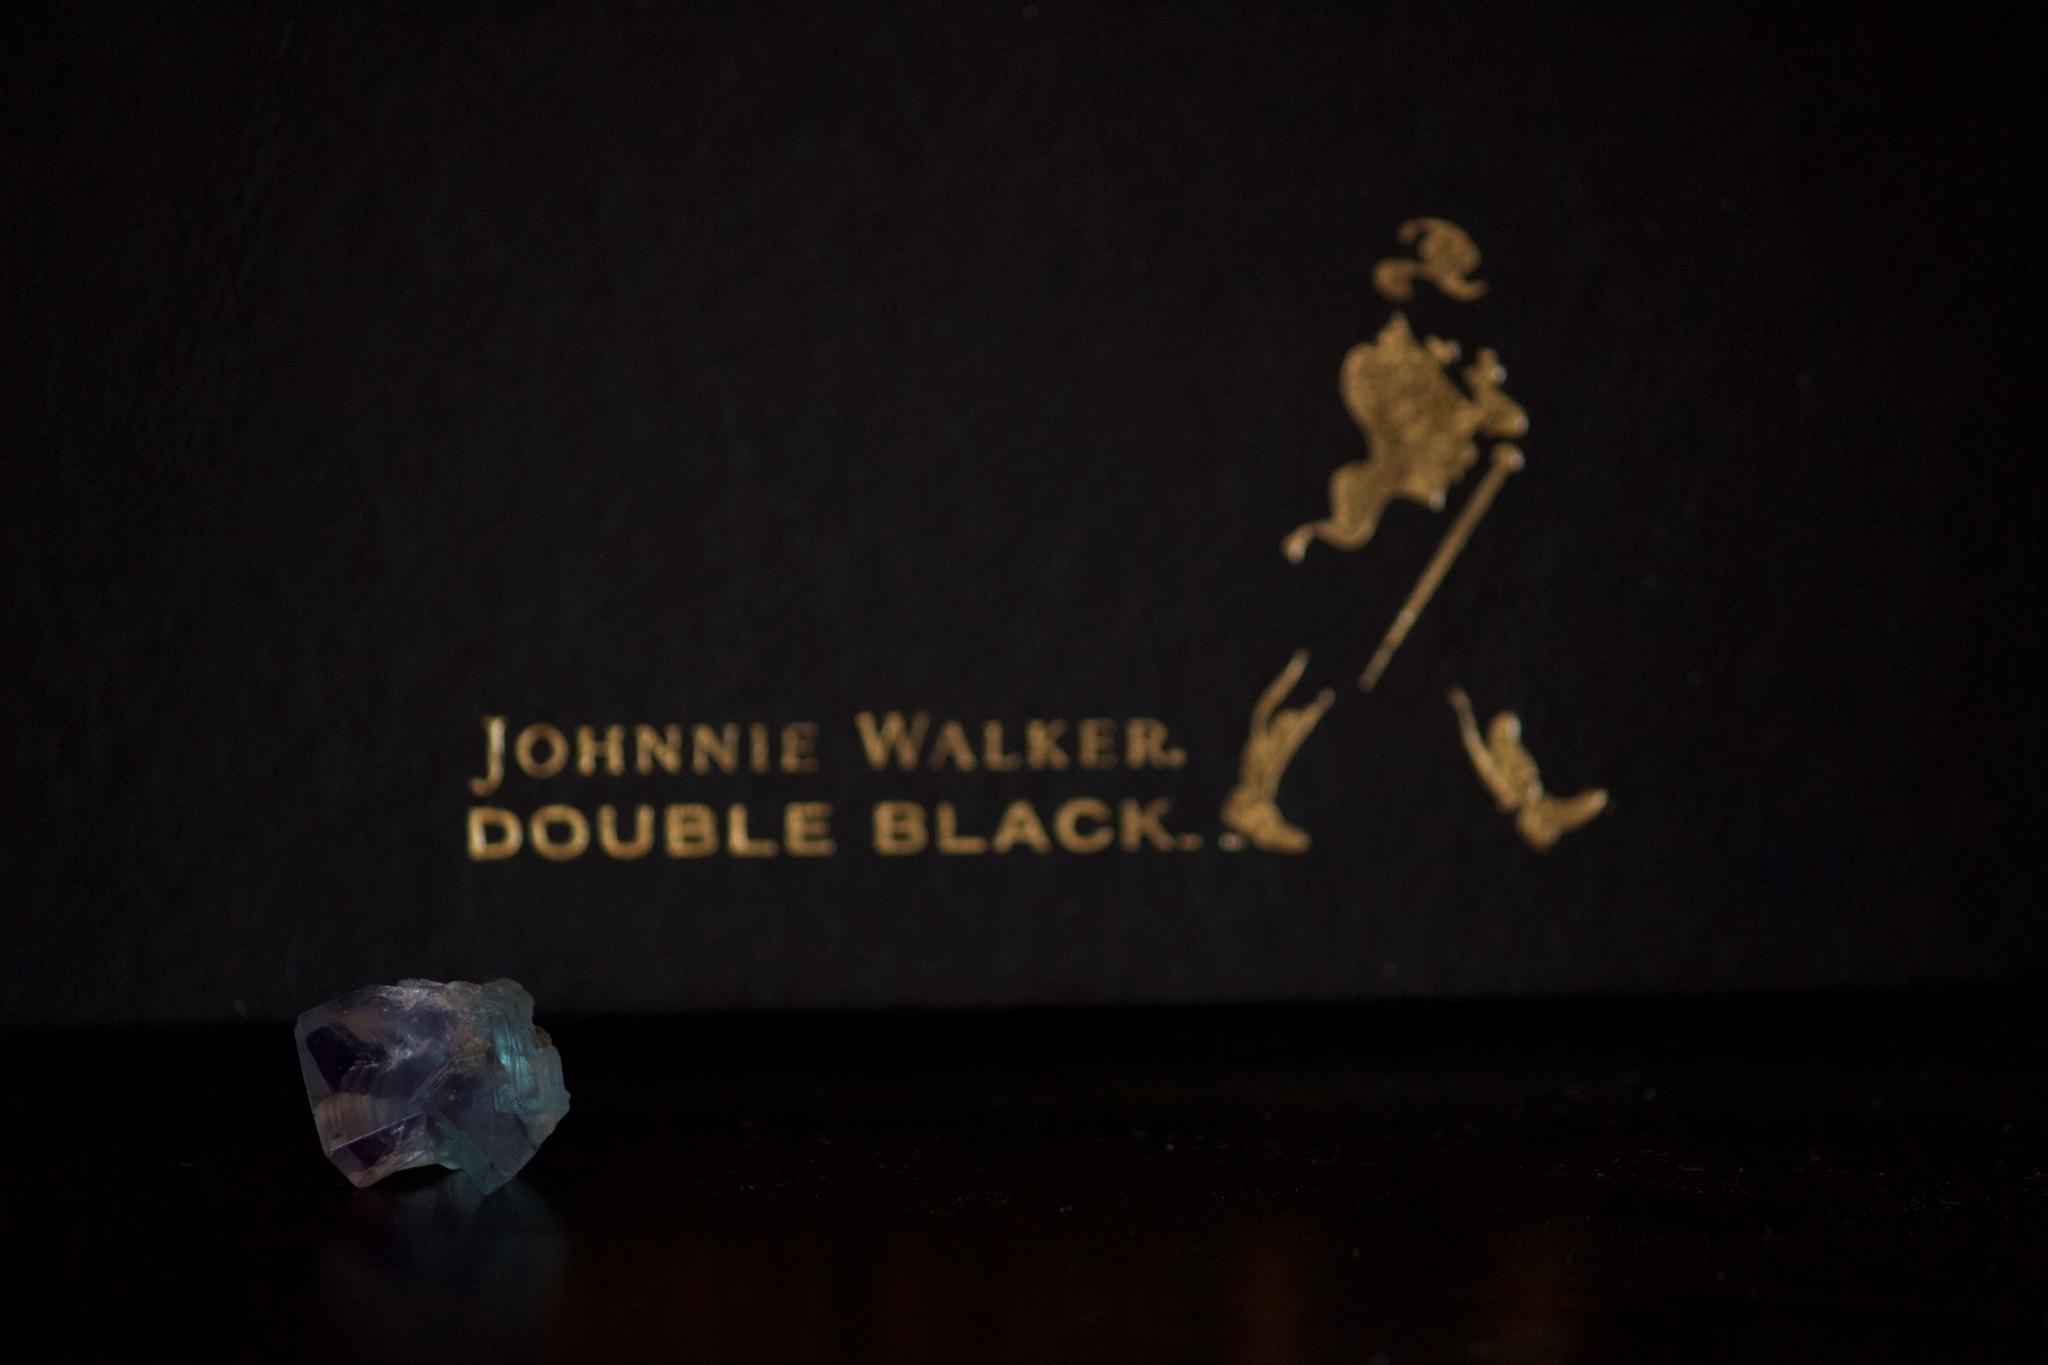 Johnnie Walker by Guido Muller